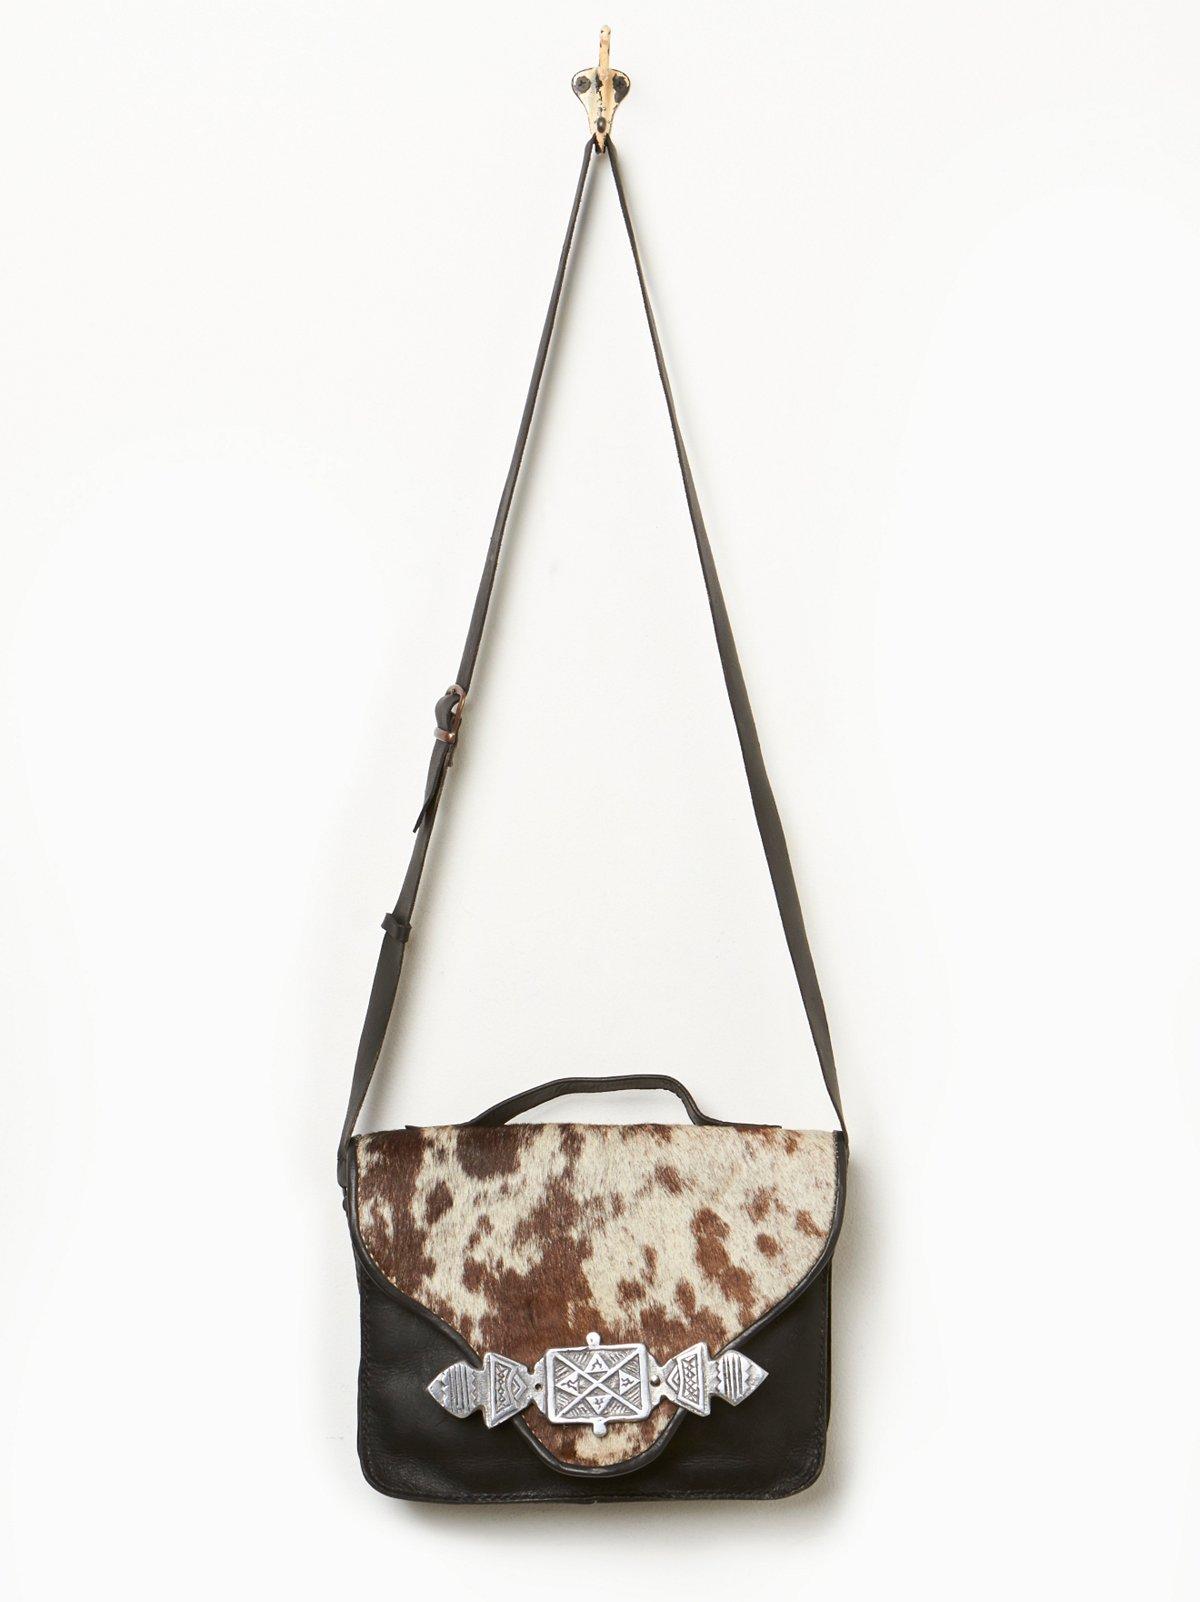 Norte Leather Bag